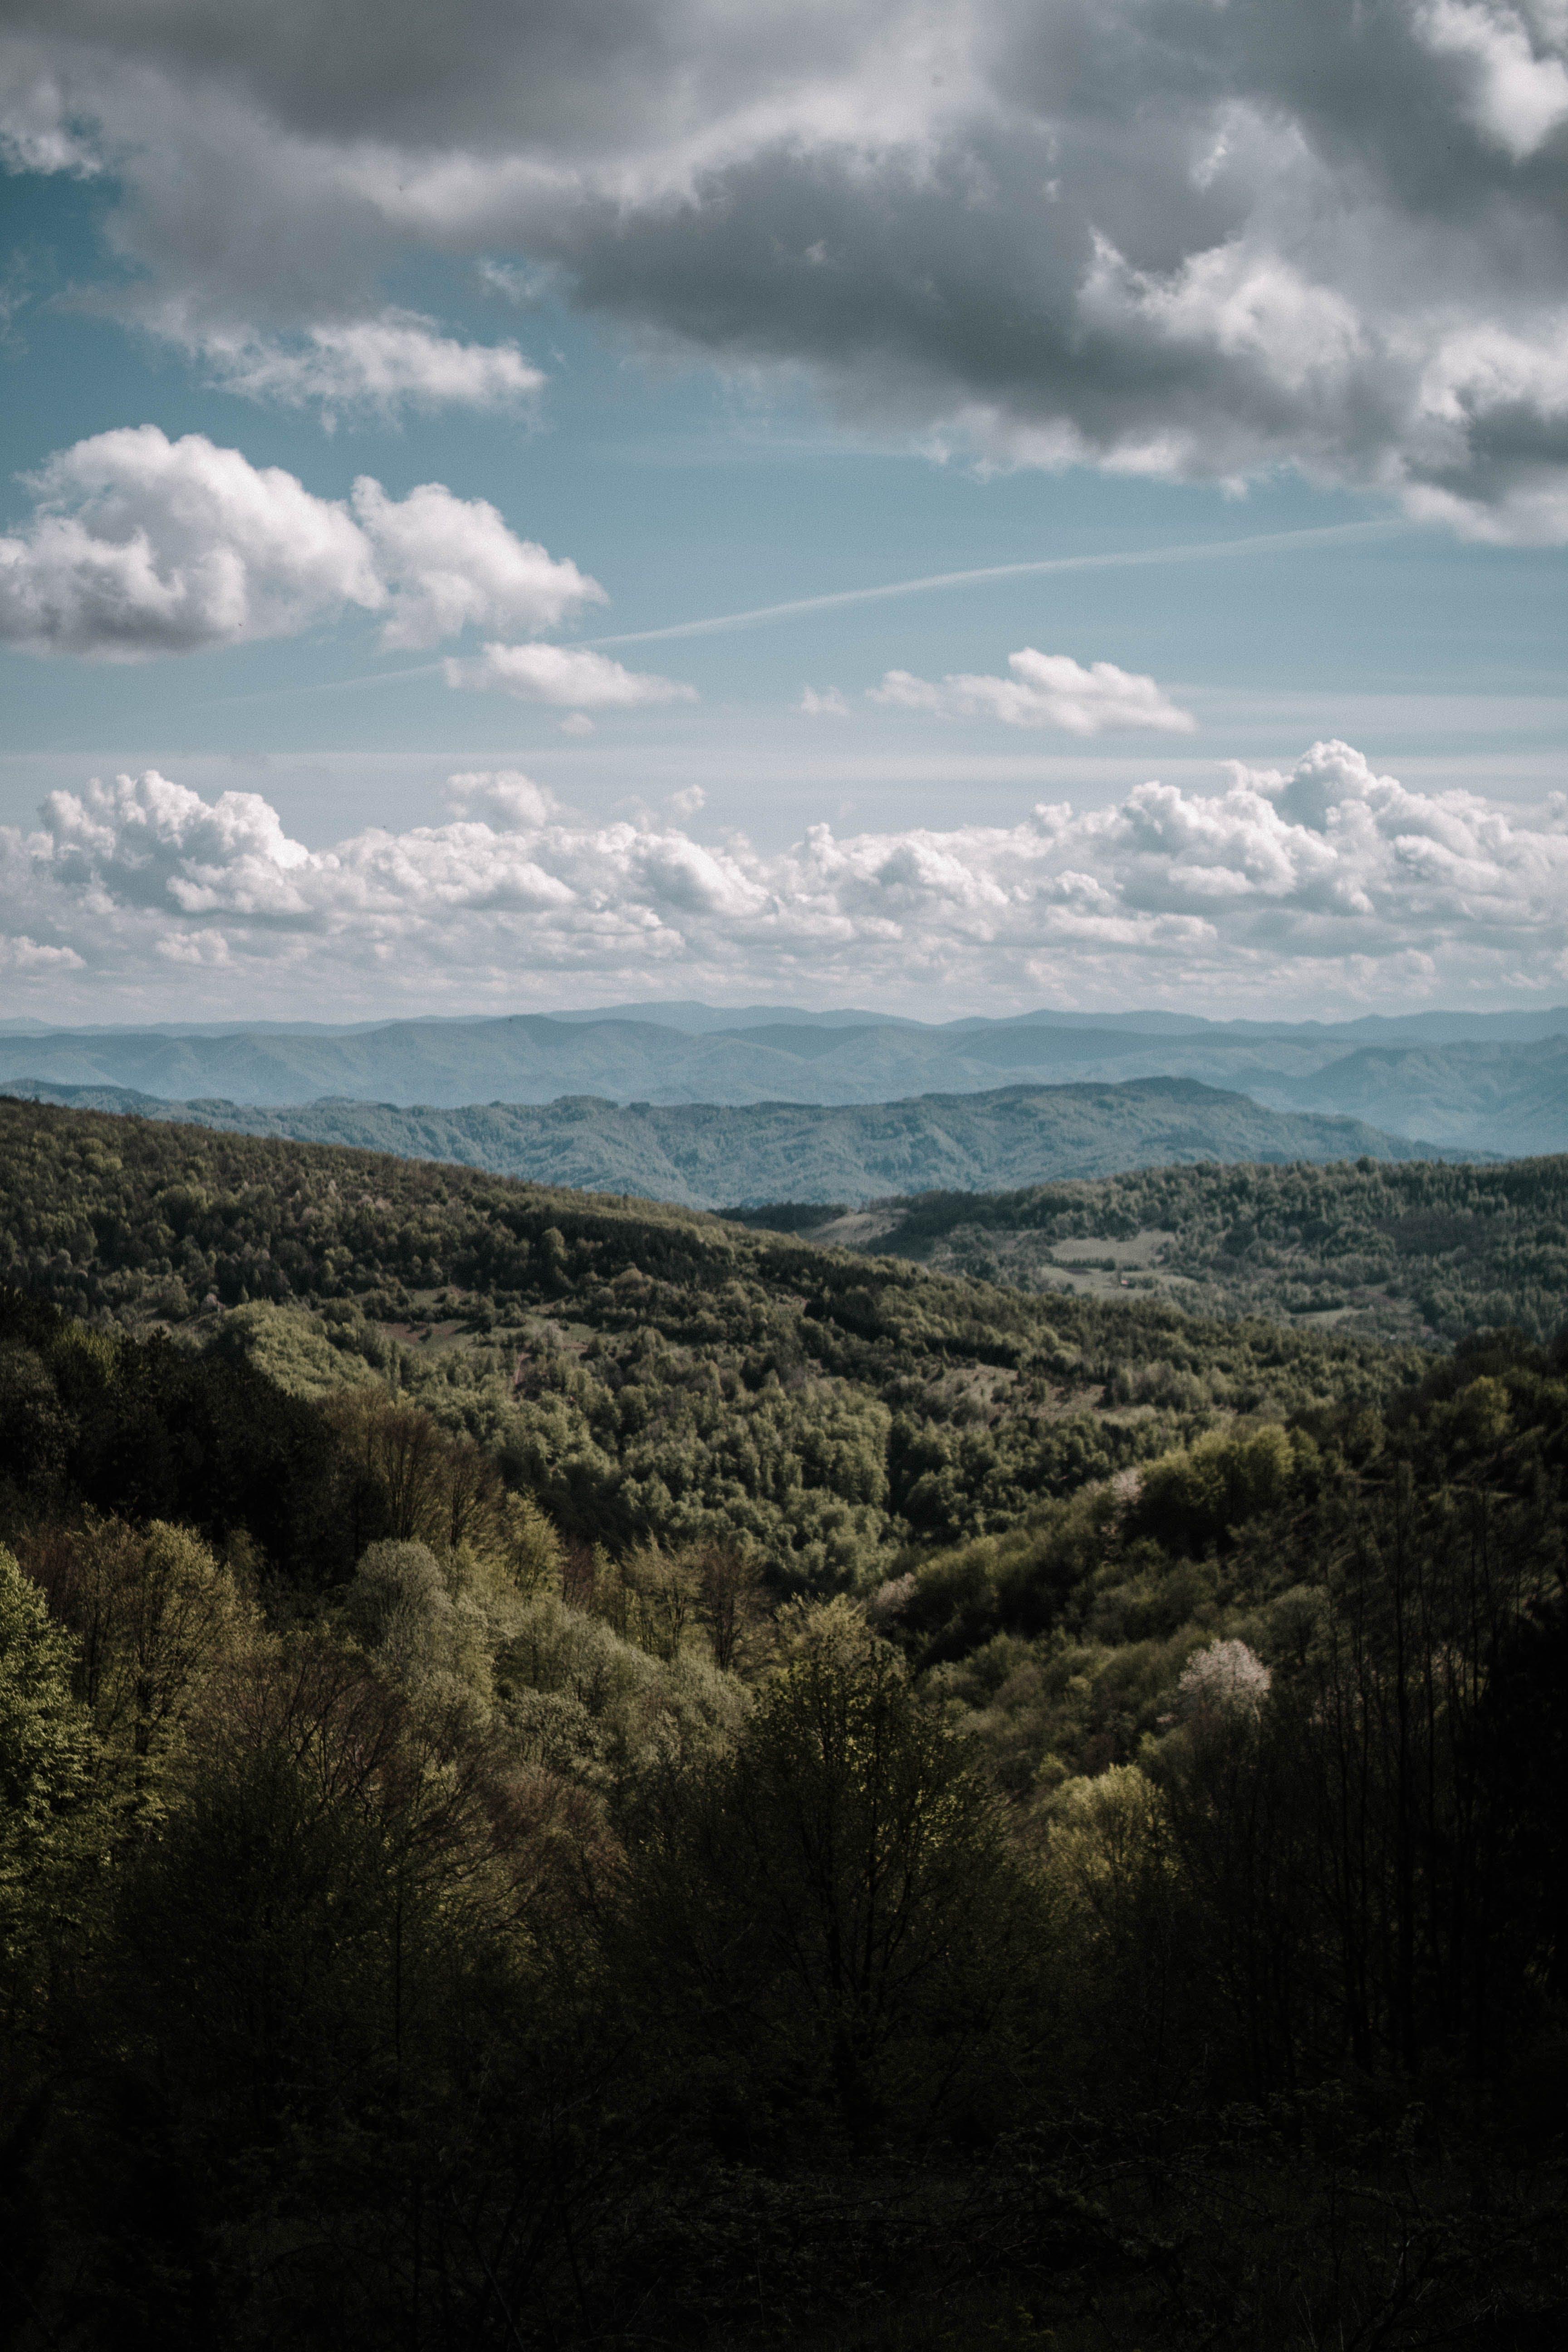 Kostenloses Stock Foto zu abenteuer, bäume, berg, blauer himmel